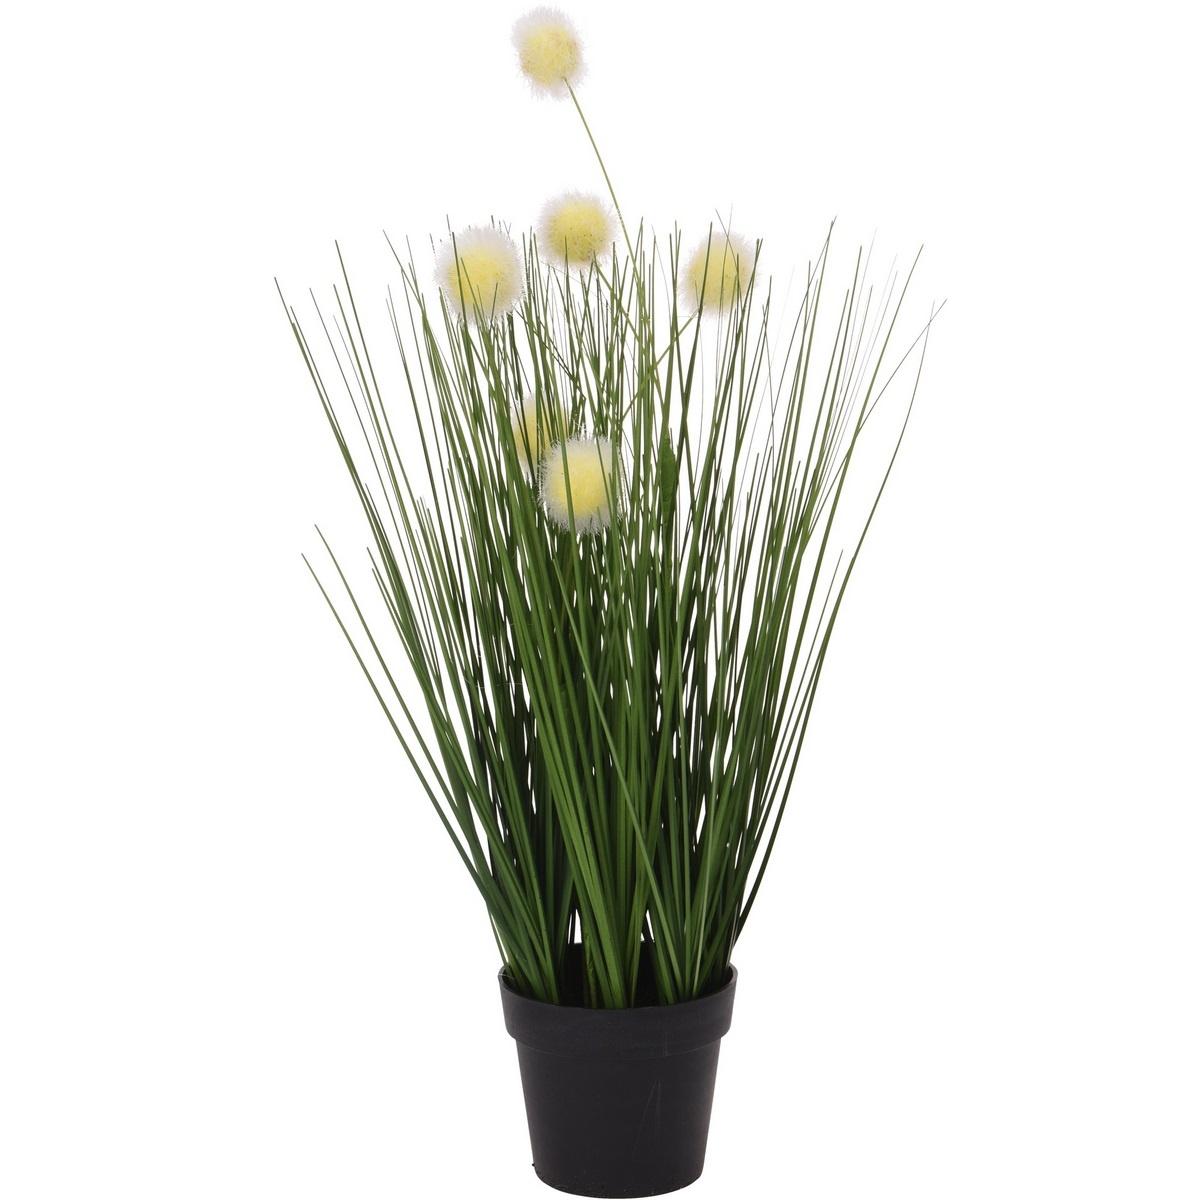 Koopman Umelá kvitnúca tráva Eleonore, 46 cm